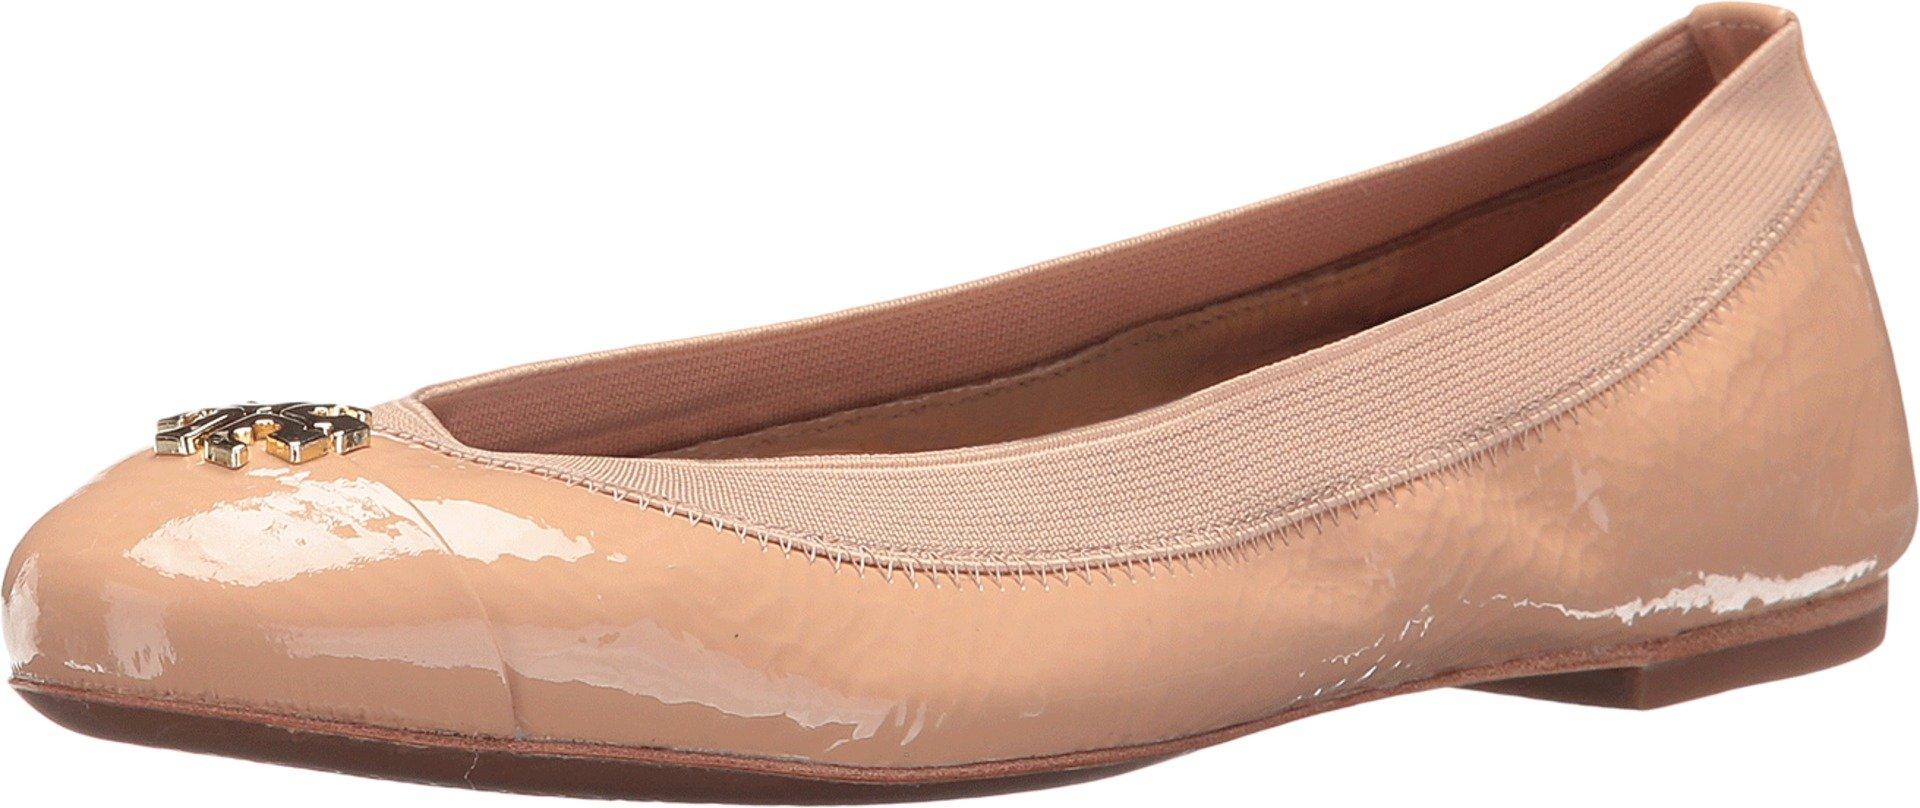 Tory Burch Jolie Ballet Flat (8 B (M) US, Light Oak) by Tory Burch (Image #1)